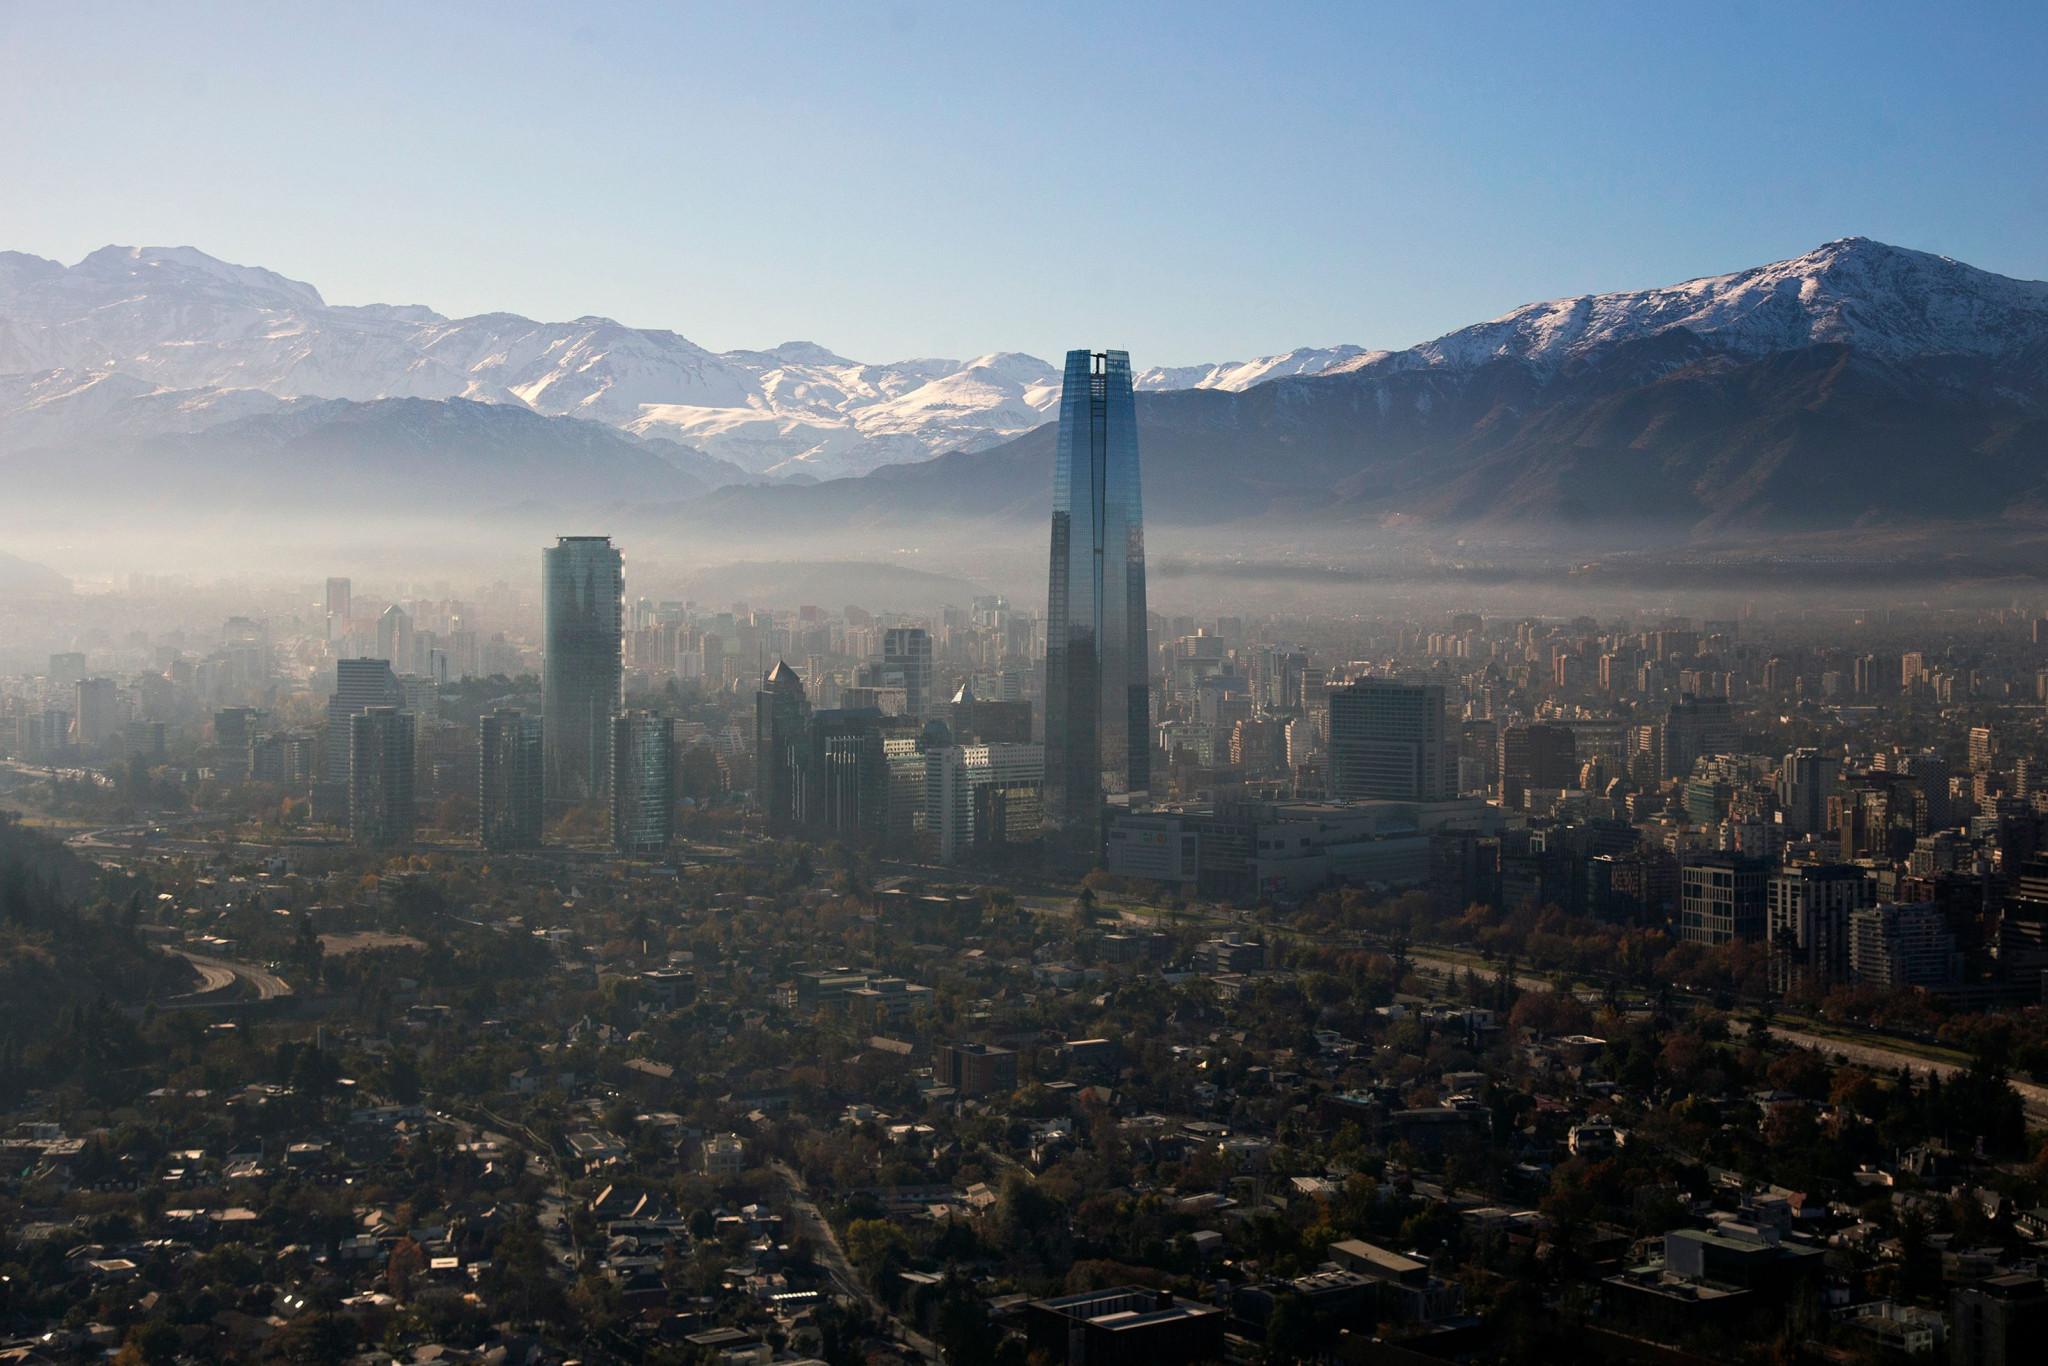 ADN announced as new media partner of Santiago 2023 Pan American Games